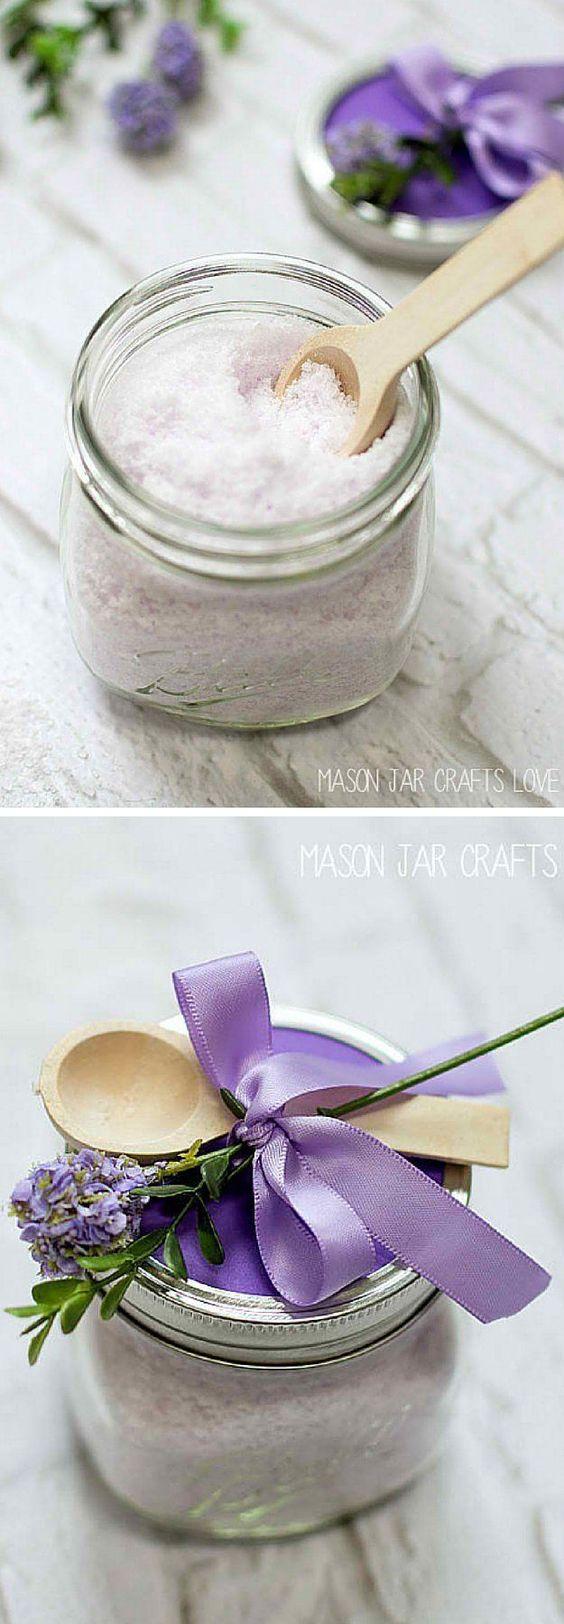 Lavender Mint Bath Salts | 17 DIY Bath Salts | Learn How To Make The Most Relaxing Bath Salt Recipes by DIY Ready at http://diyready.com/17-diy-bath-salts-bath-salt-recipe/: